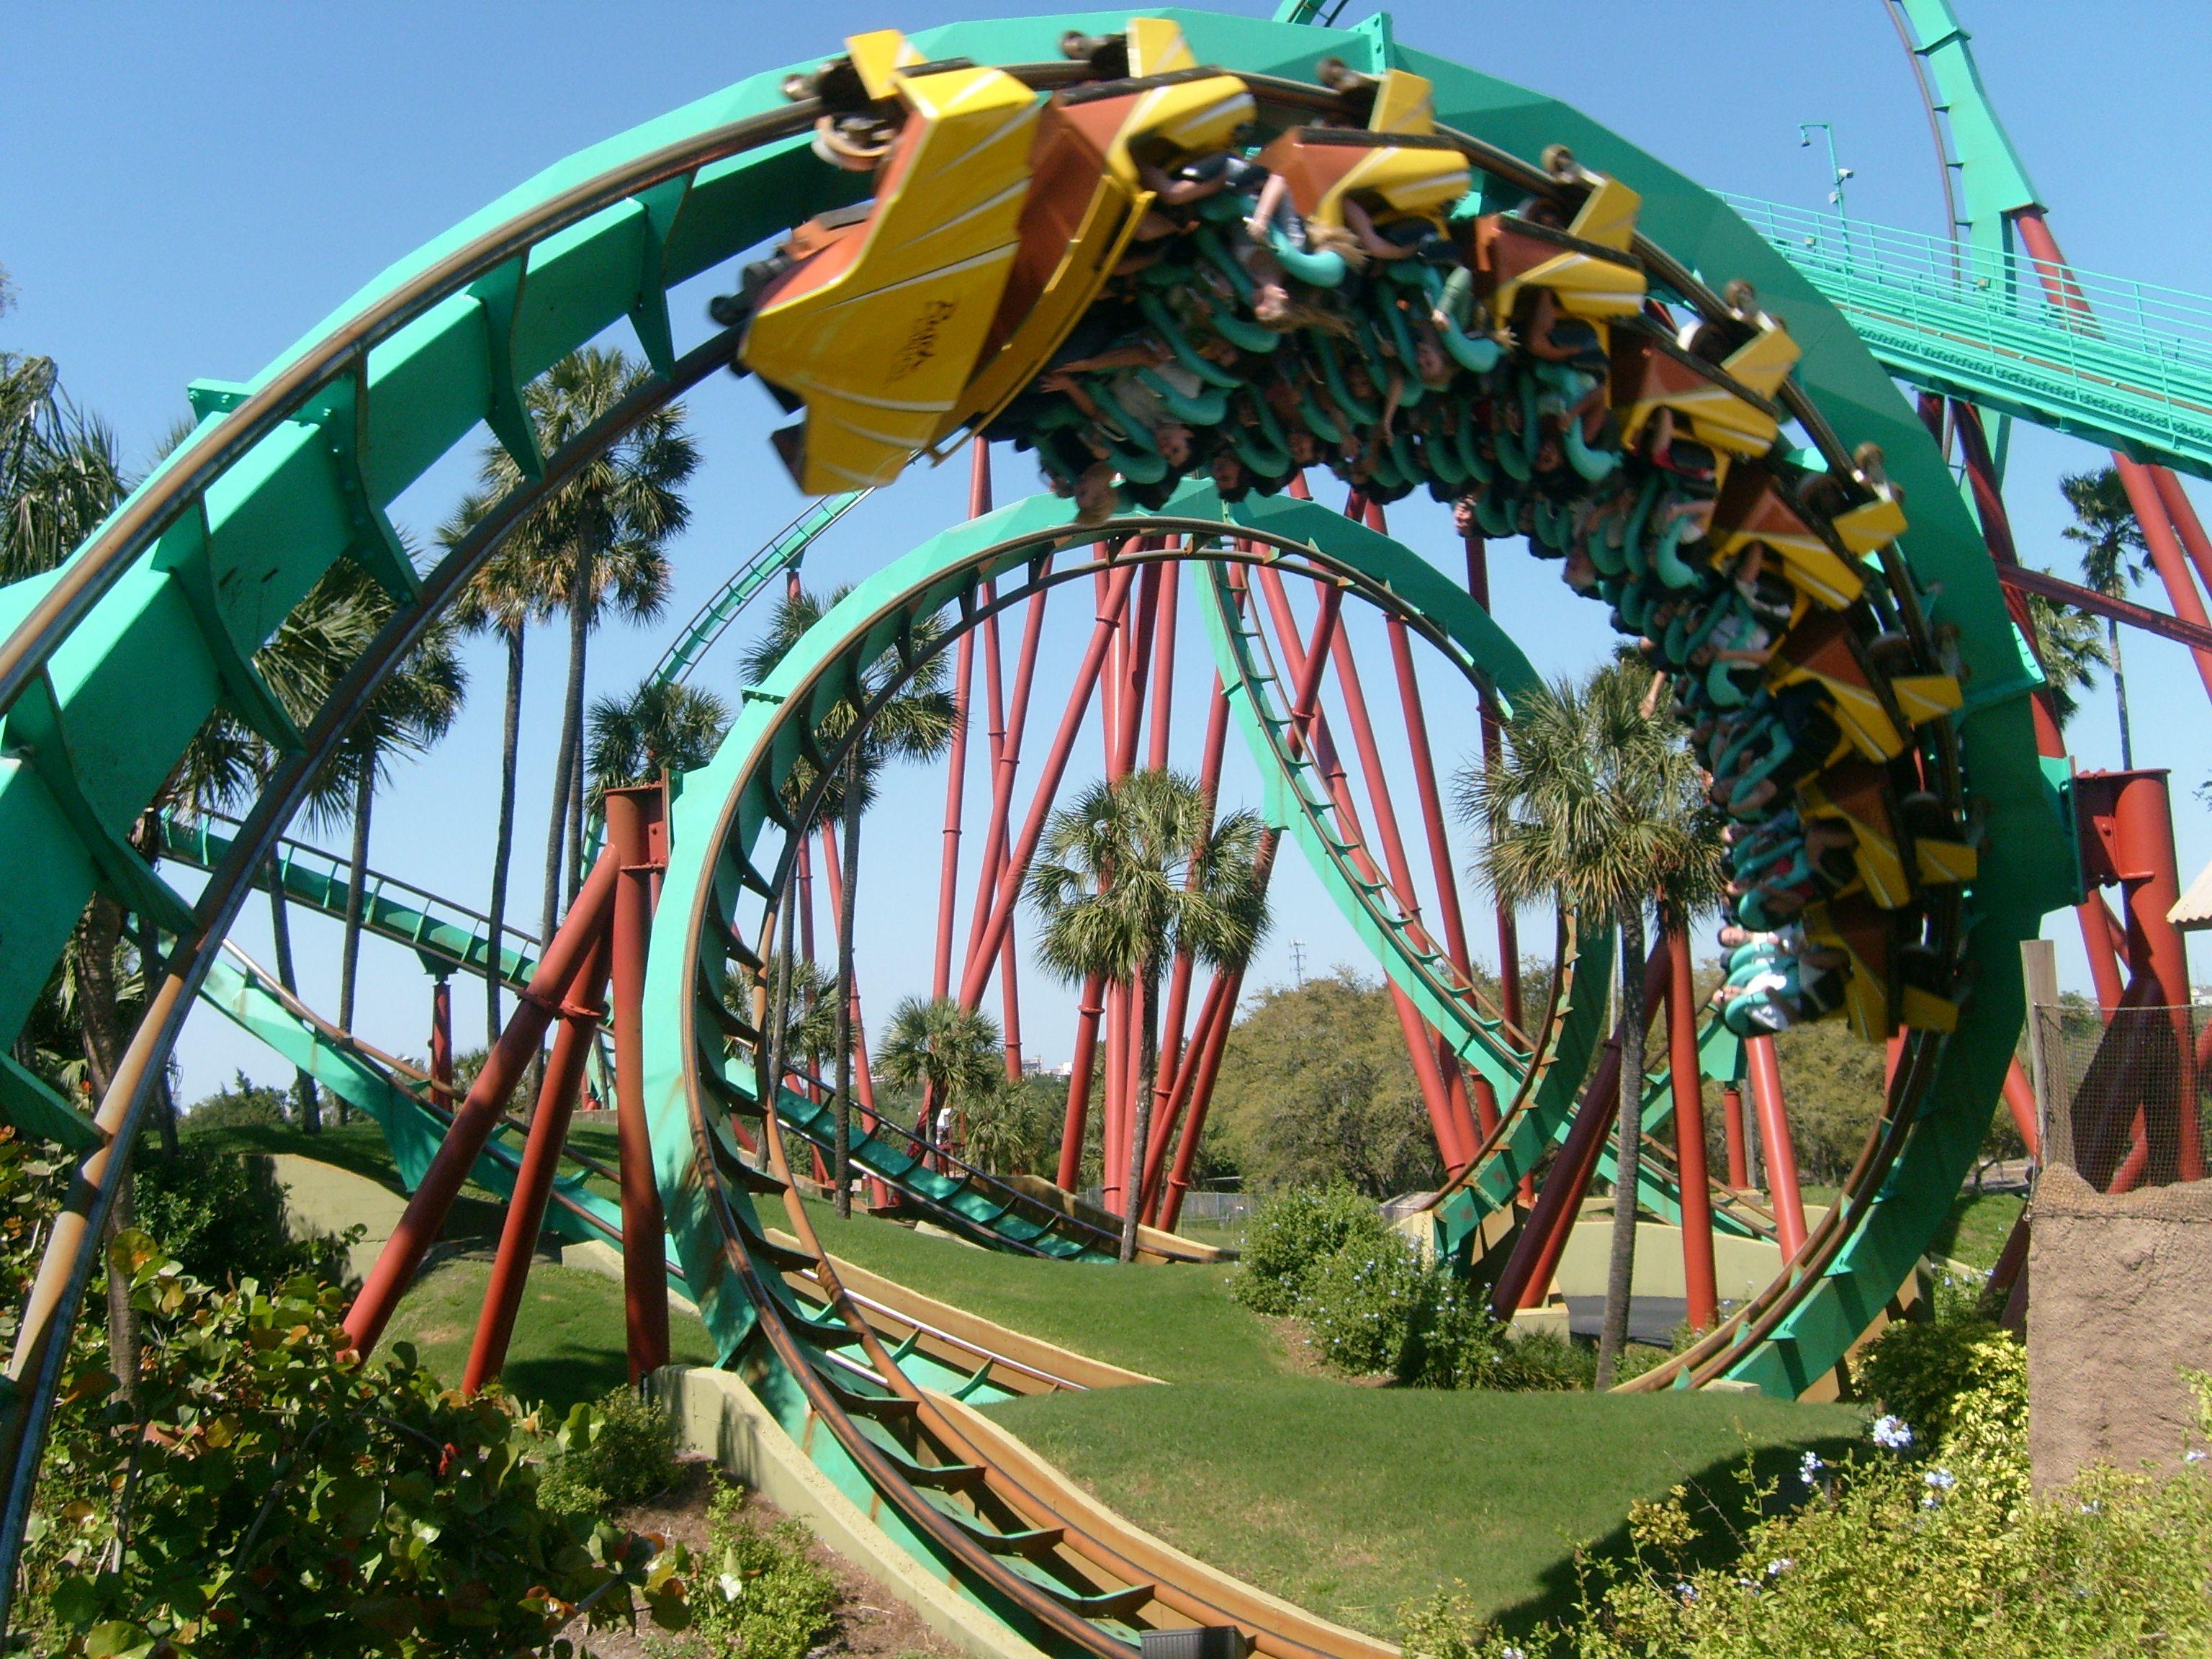 Busch Gardens Tampa Florida Busch Gardens Tampa Busch Gardens Florida Theme Parks